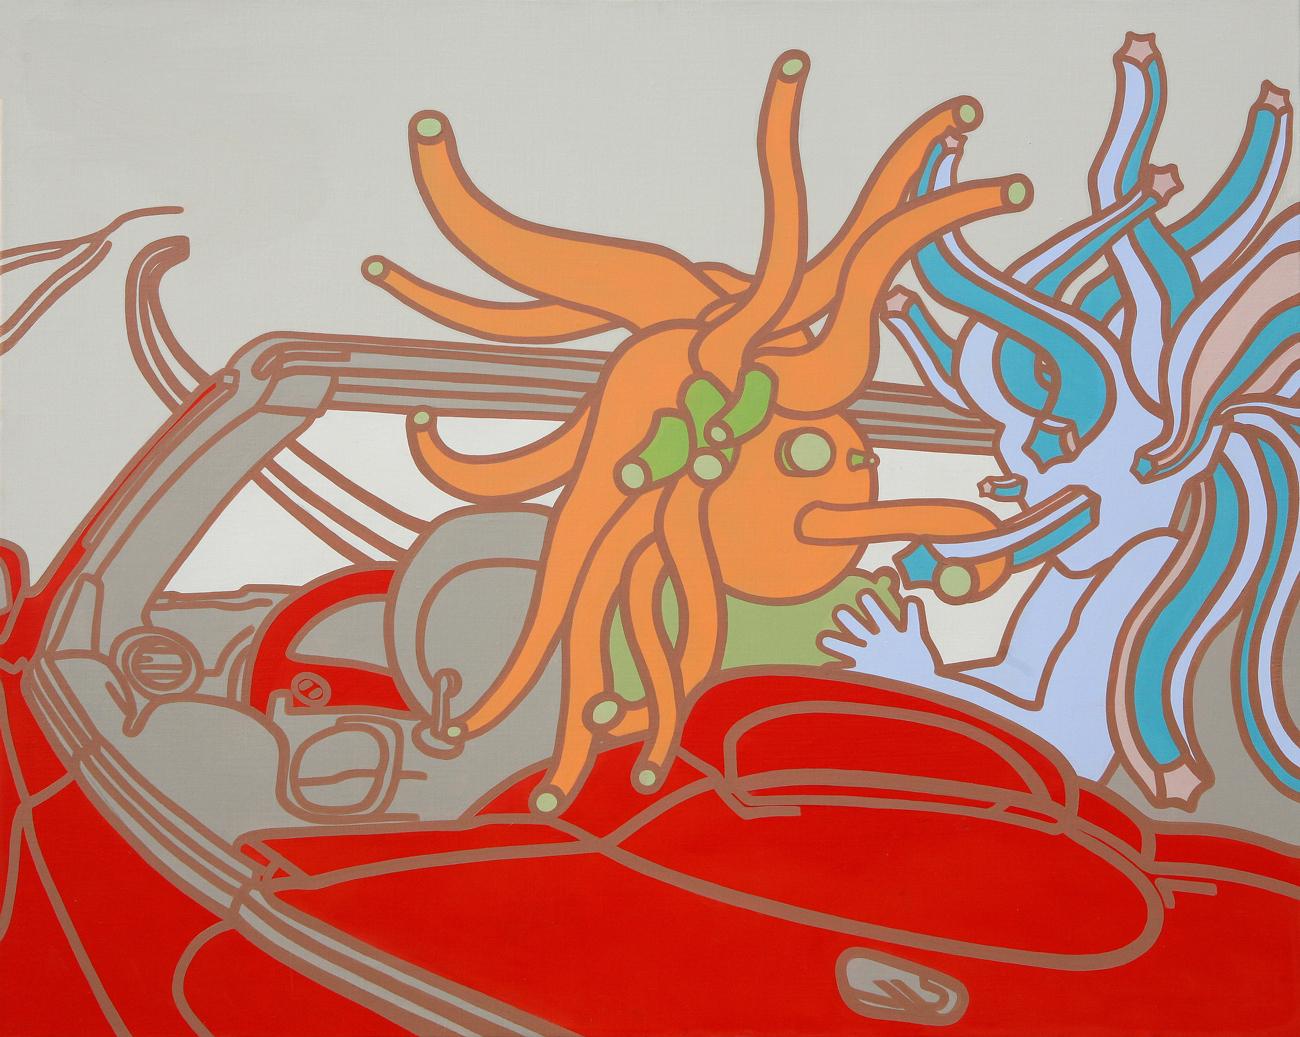 Conversation needed! Acrylic & Oil on canvas 72.7x 91cm 2008